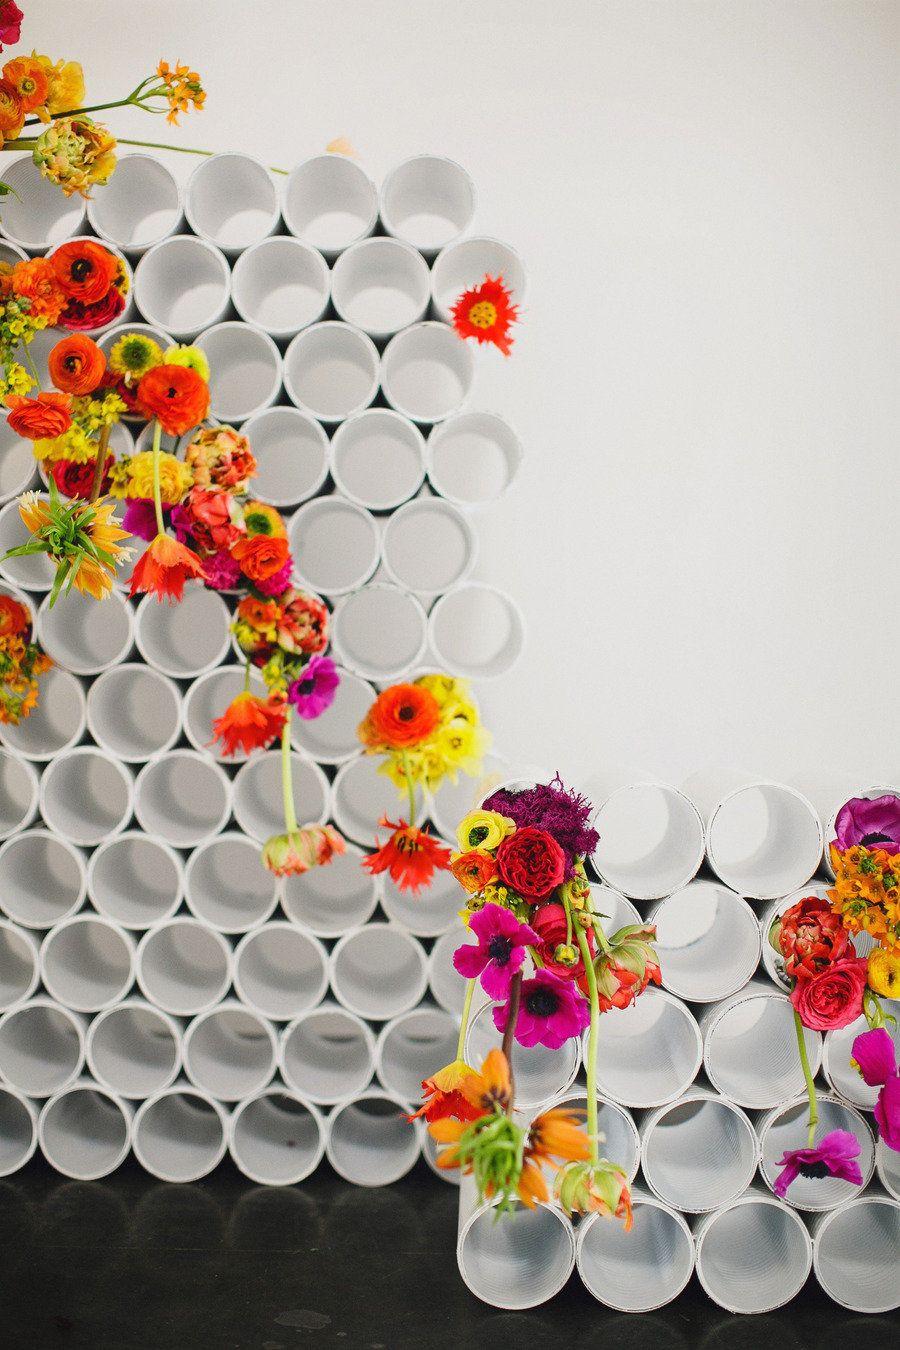 neon rainbow modern wedding backdrop | Creative decor ideas ...